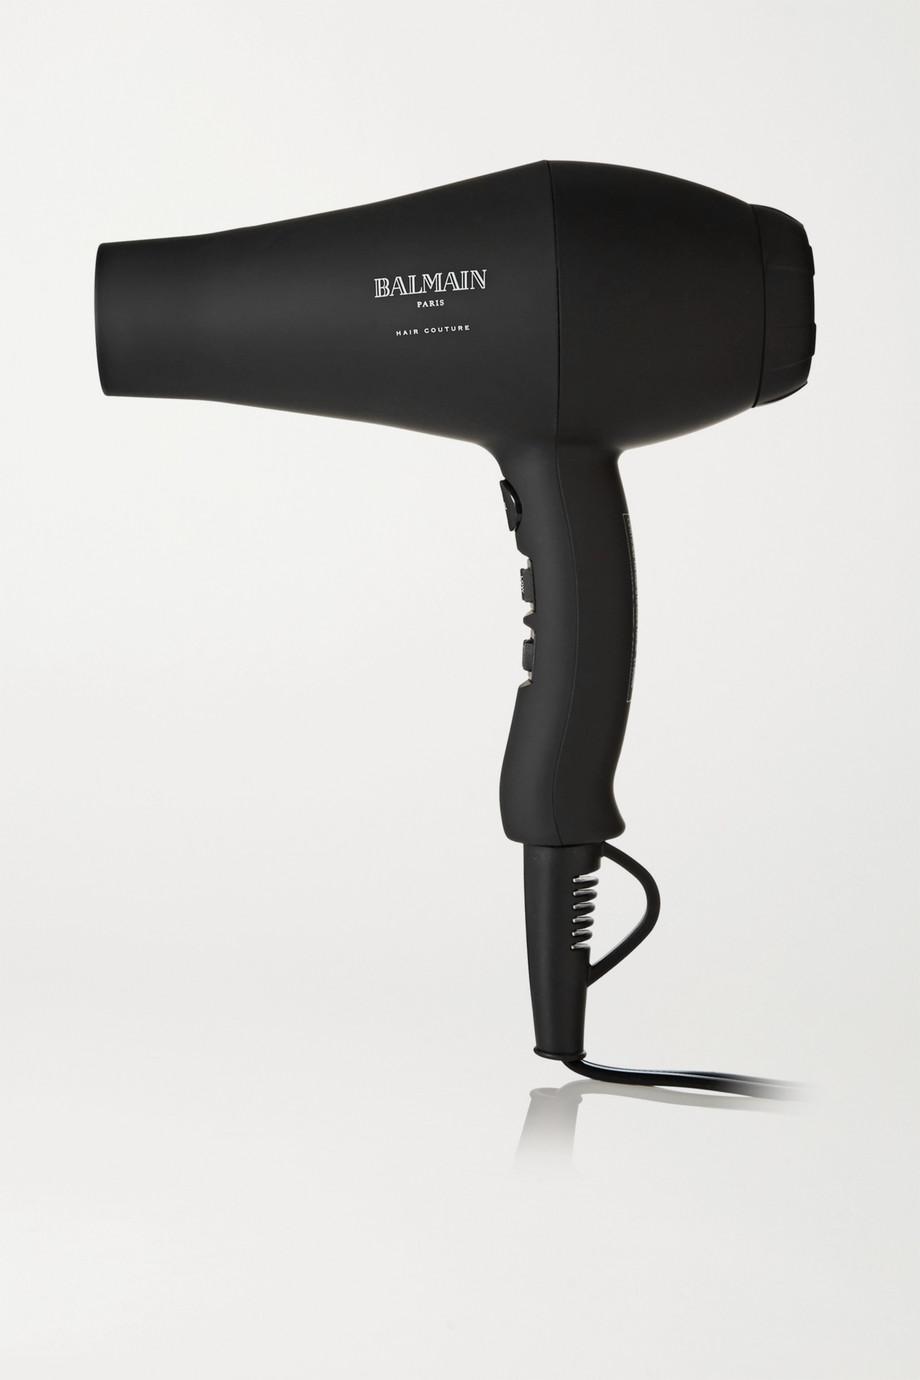 Balmain Paris Hair Couture Infrared Blow Dryer - US 2-pin plug